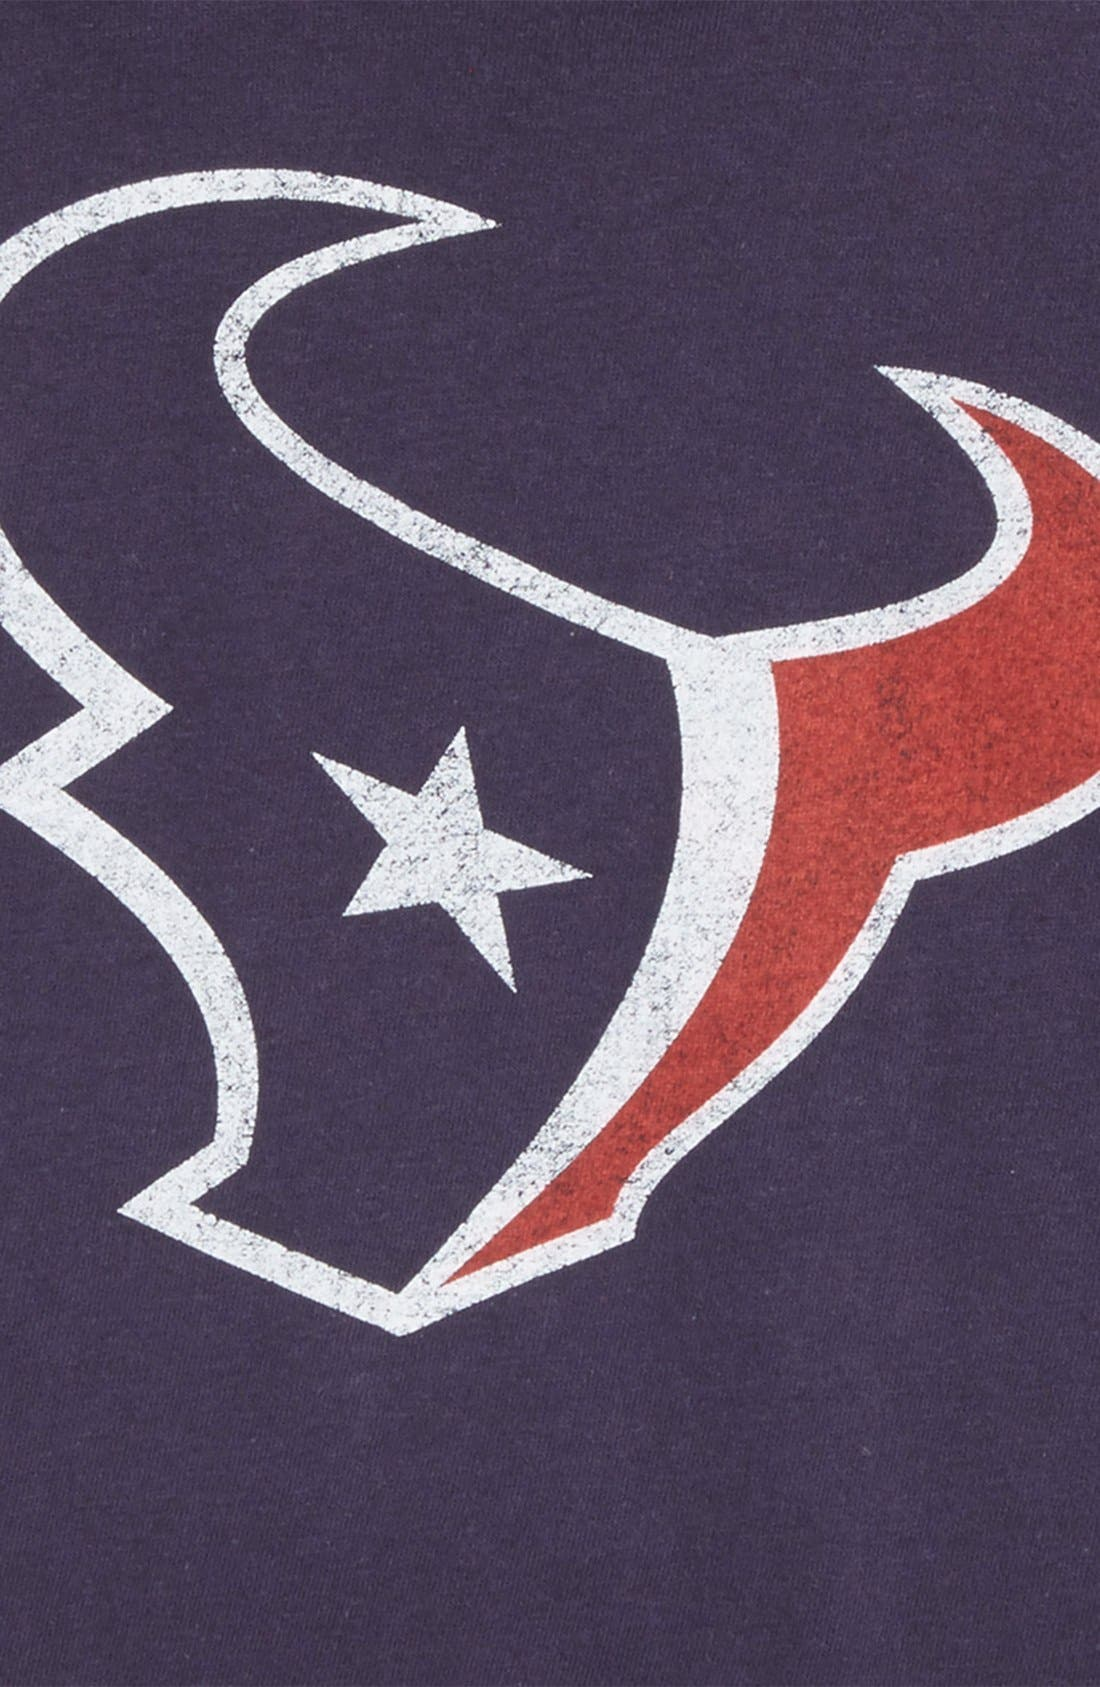 'NFL - Houston Texans' Distressed Logo Graphic T-Shirt,                             Alternate thumbnail 2, color,                             Texans